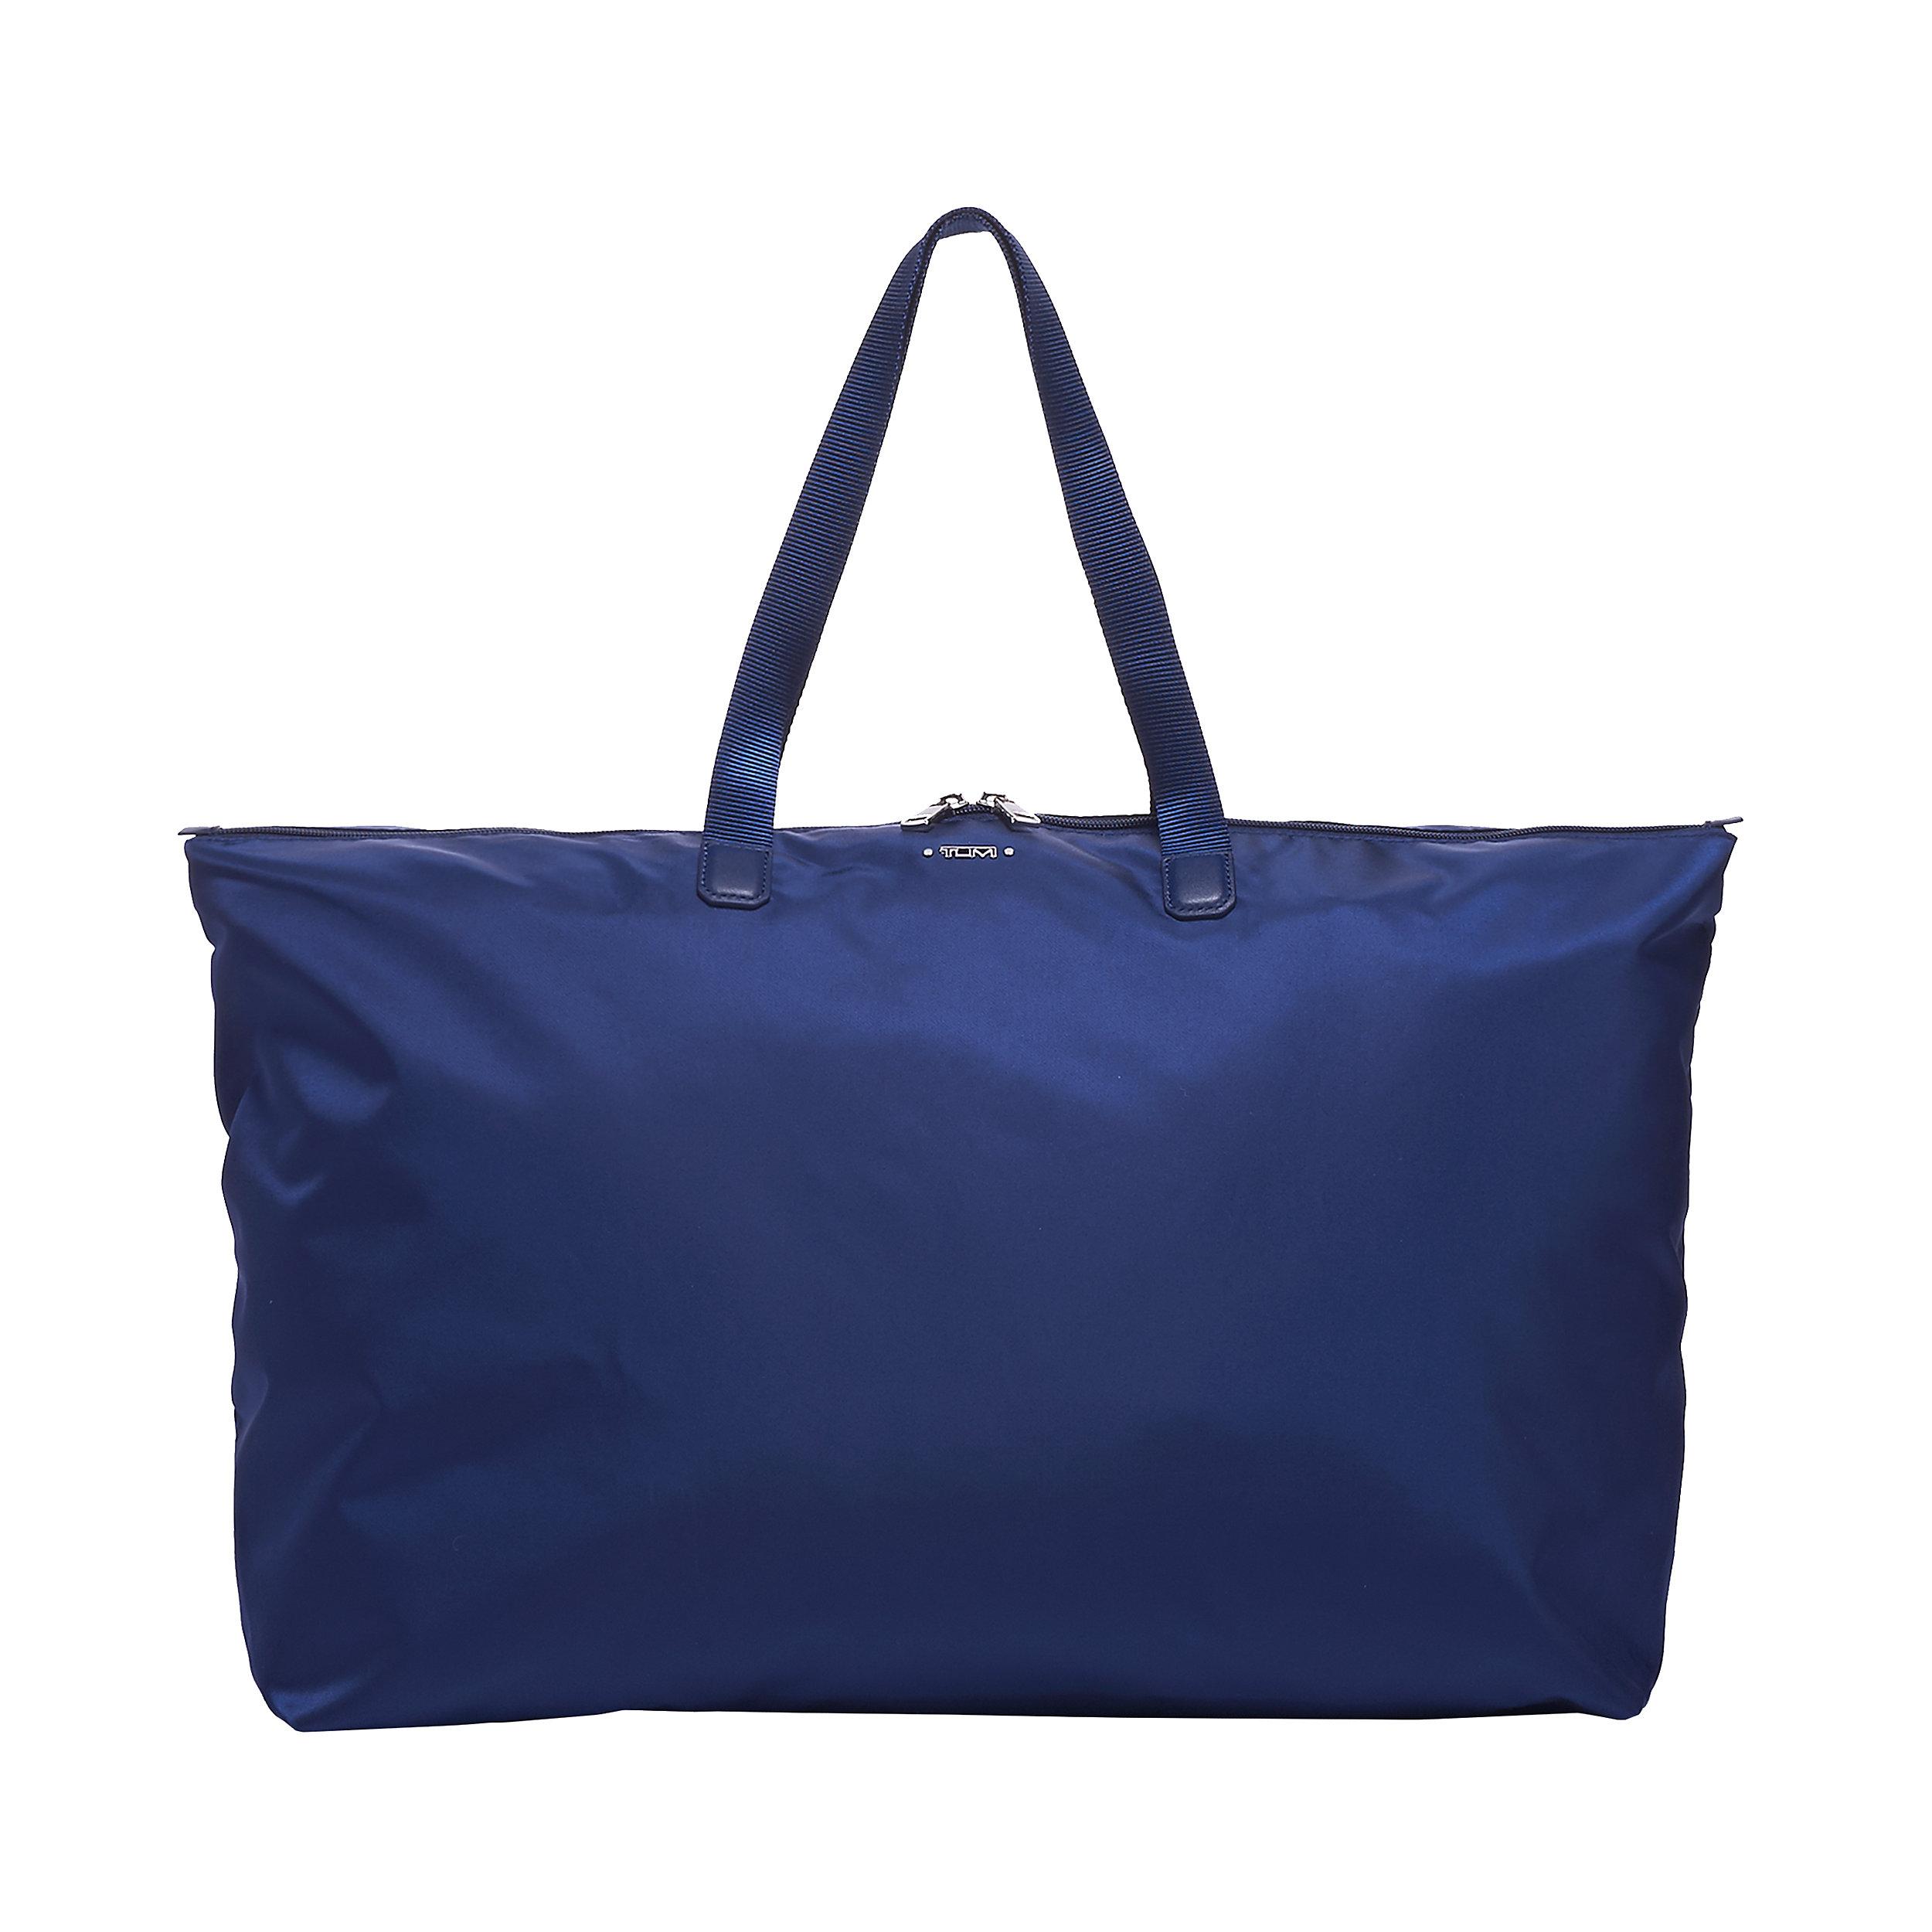 Tote Bag Just in Case foldable Voyageur 40 Liter